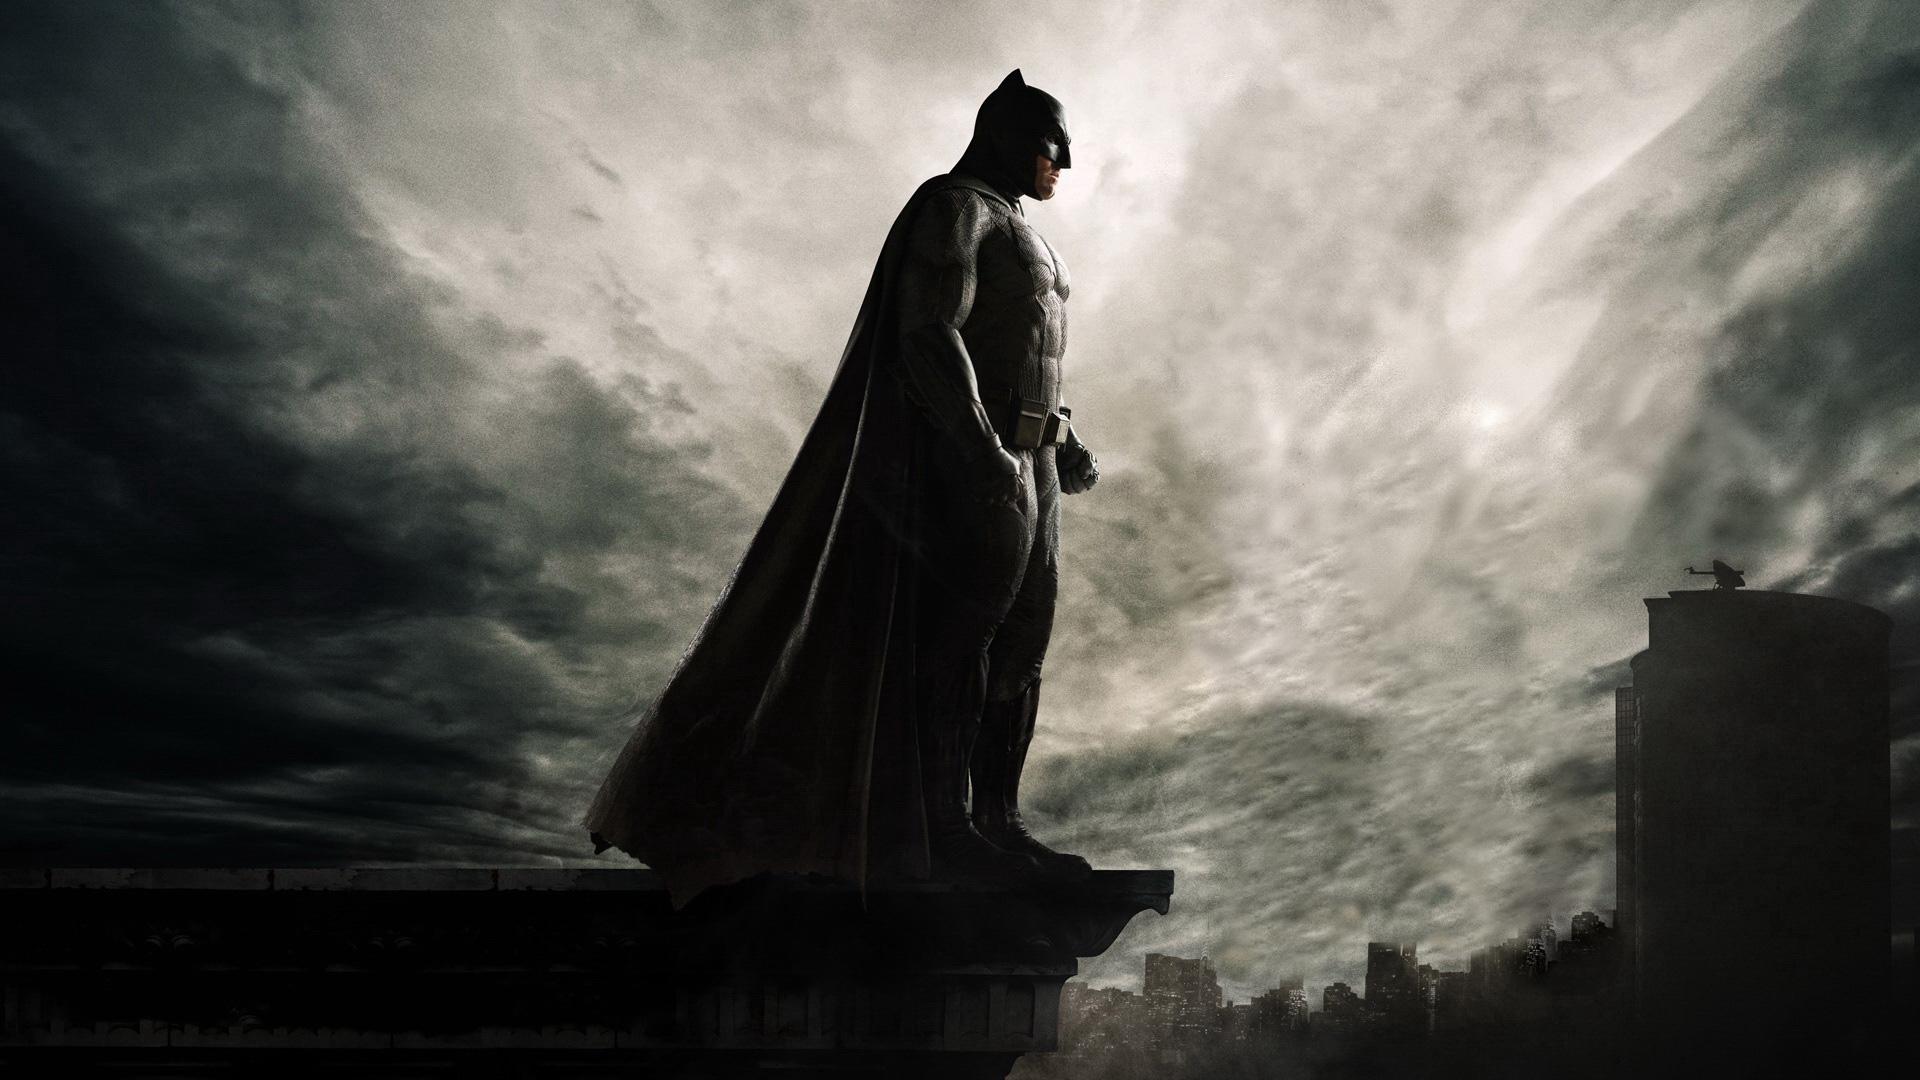 Batman Vs Superman Wallpaper 3d Batman On The Roof Of Seeing Gotham City Hd Superheroes